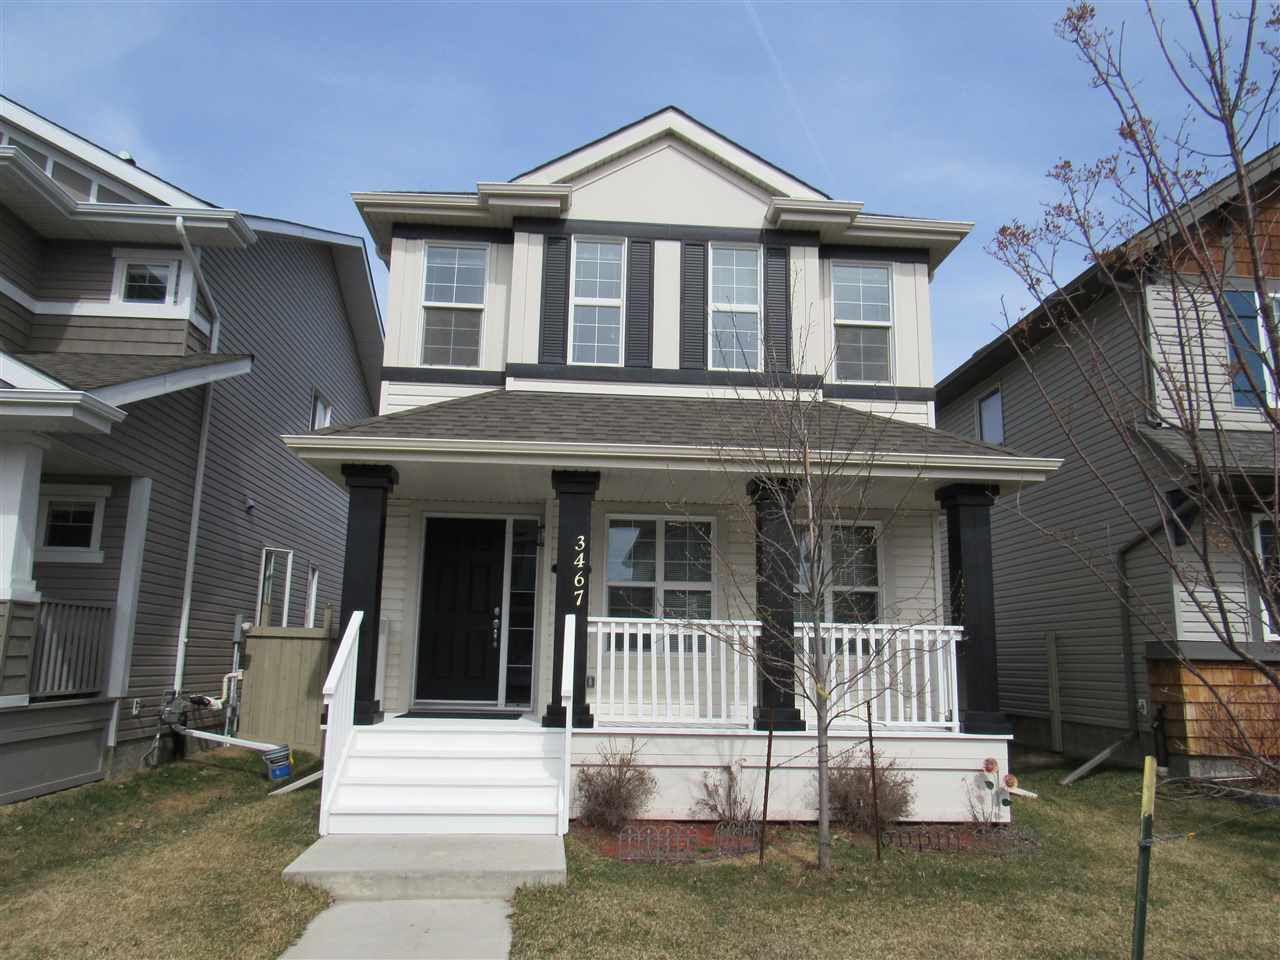 Main Photo: 3467 CUTLER Crescent in Edmonton: Zone 55 House for sale : MLS®# E4153078